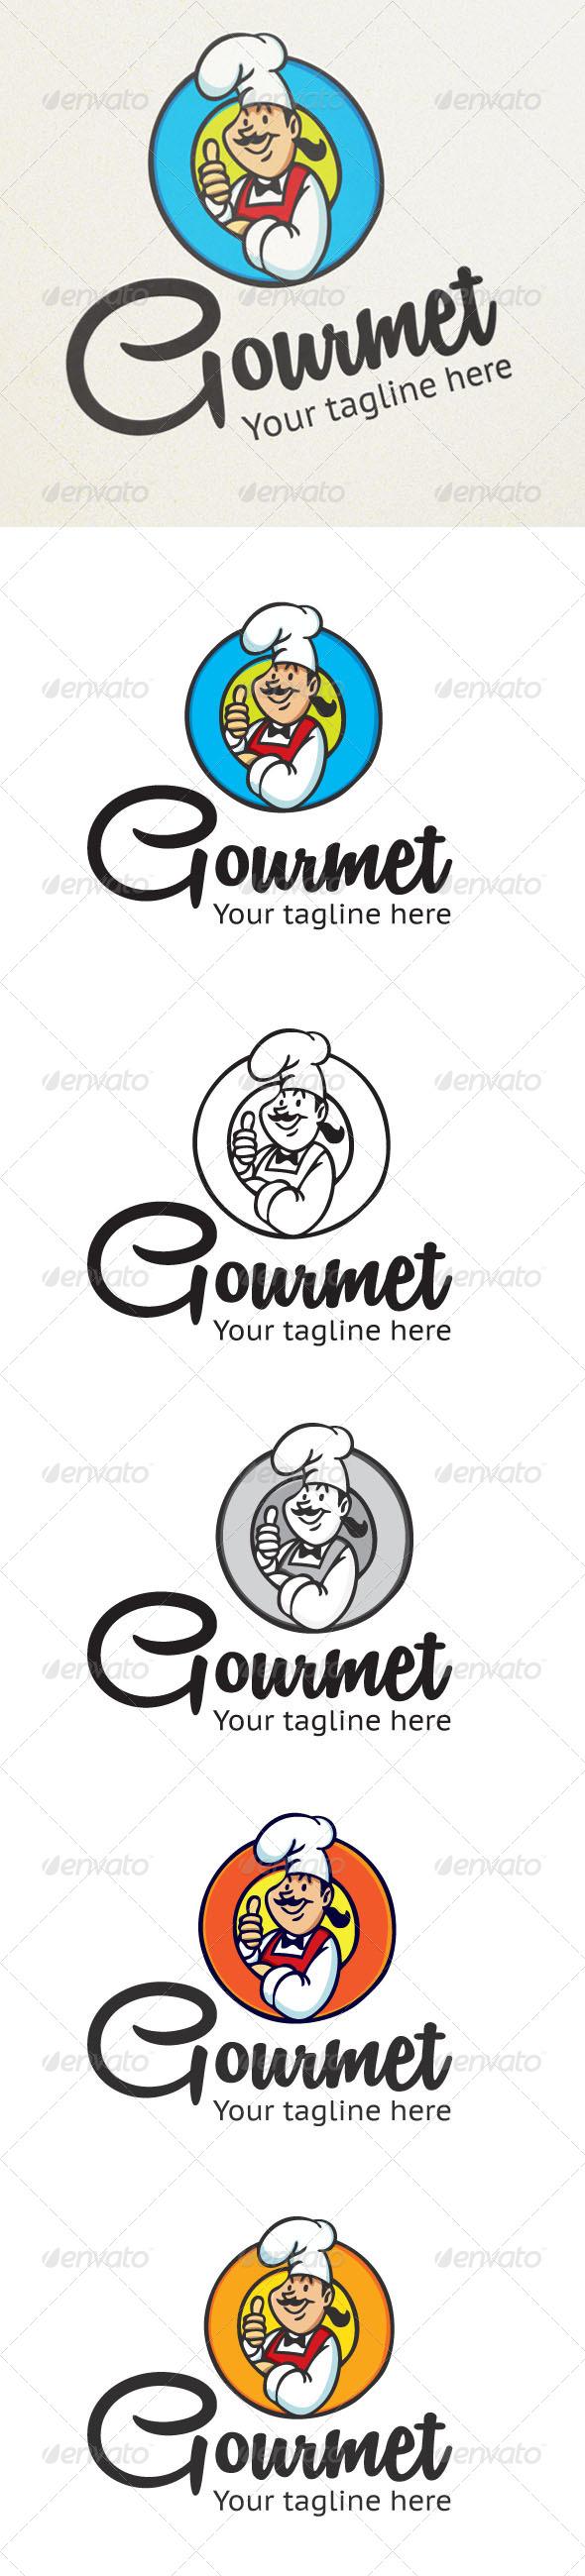 GraphicRiver Gourmet 4652281